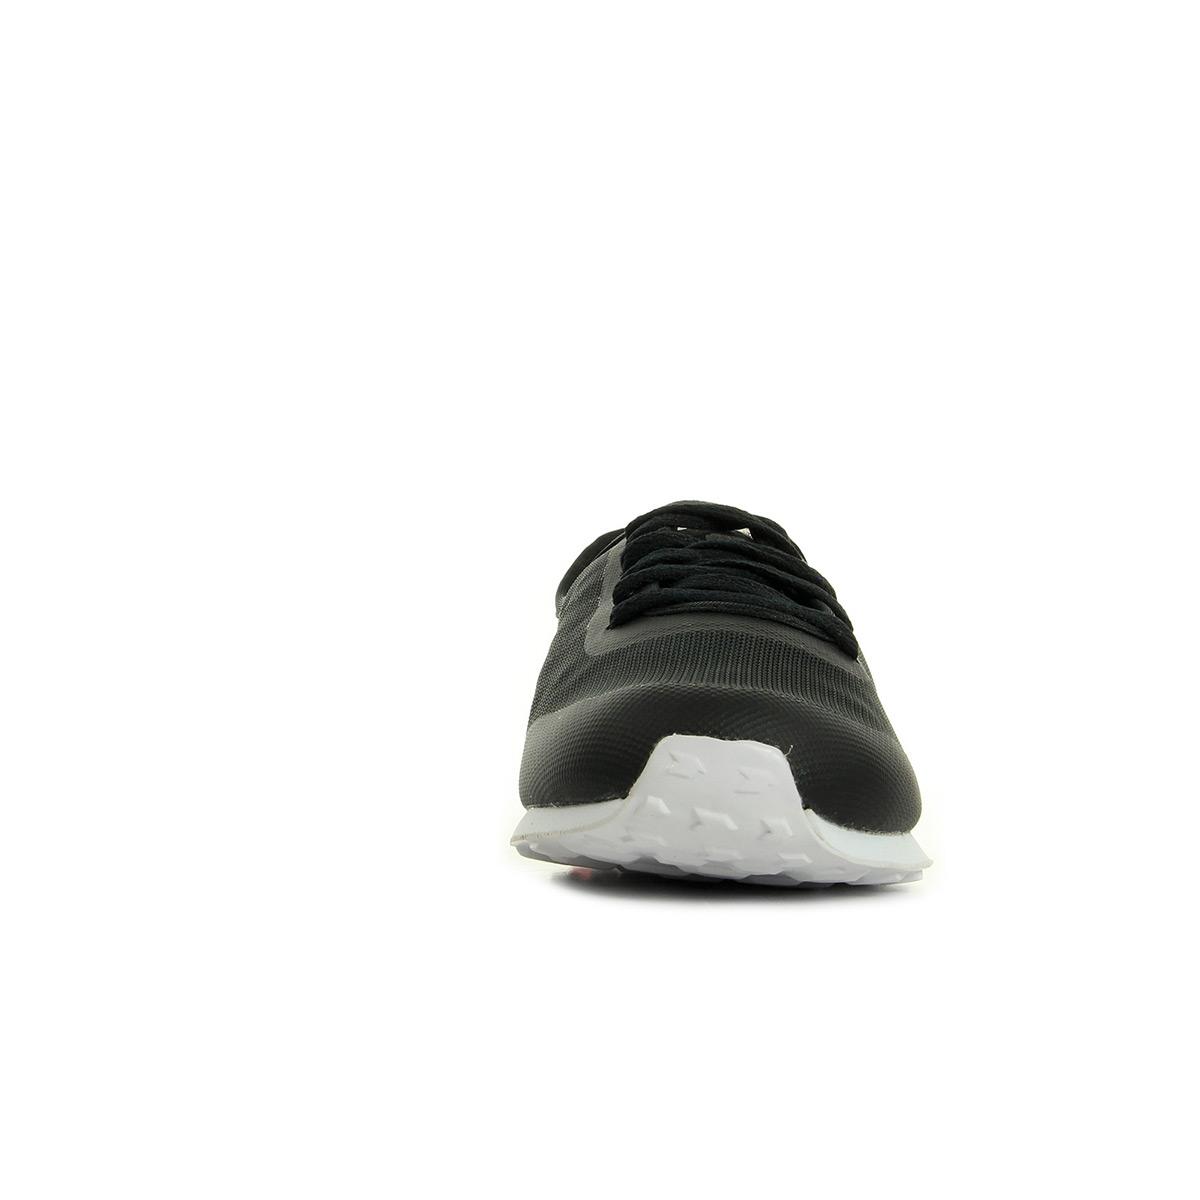 adidas Neo Style Racer Tm W F98917, Baskets mode femme